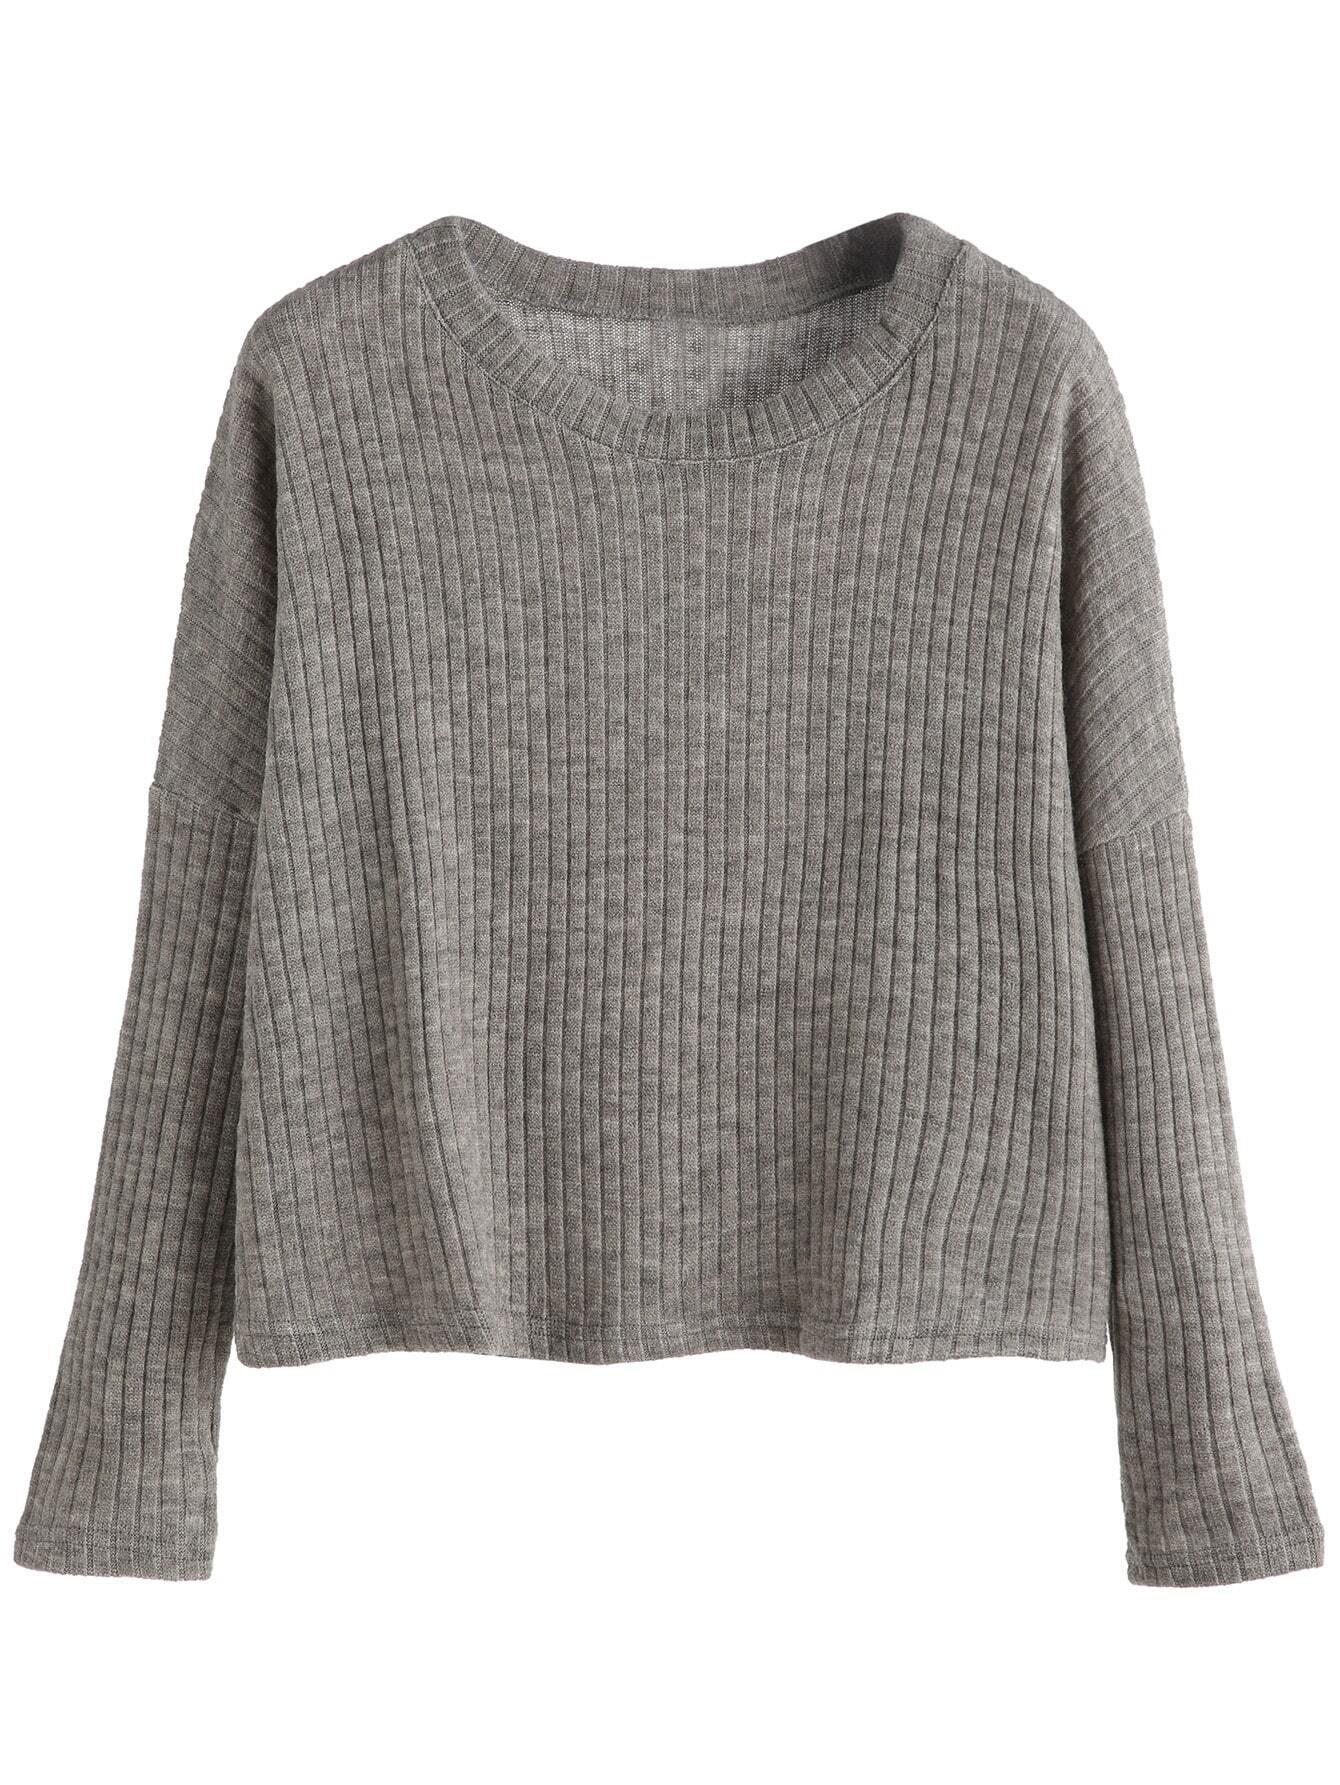 Grey Dropped Shoulder Seam Ribbed Sweater RKNI160909103